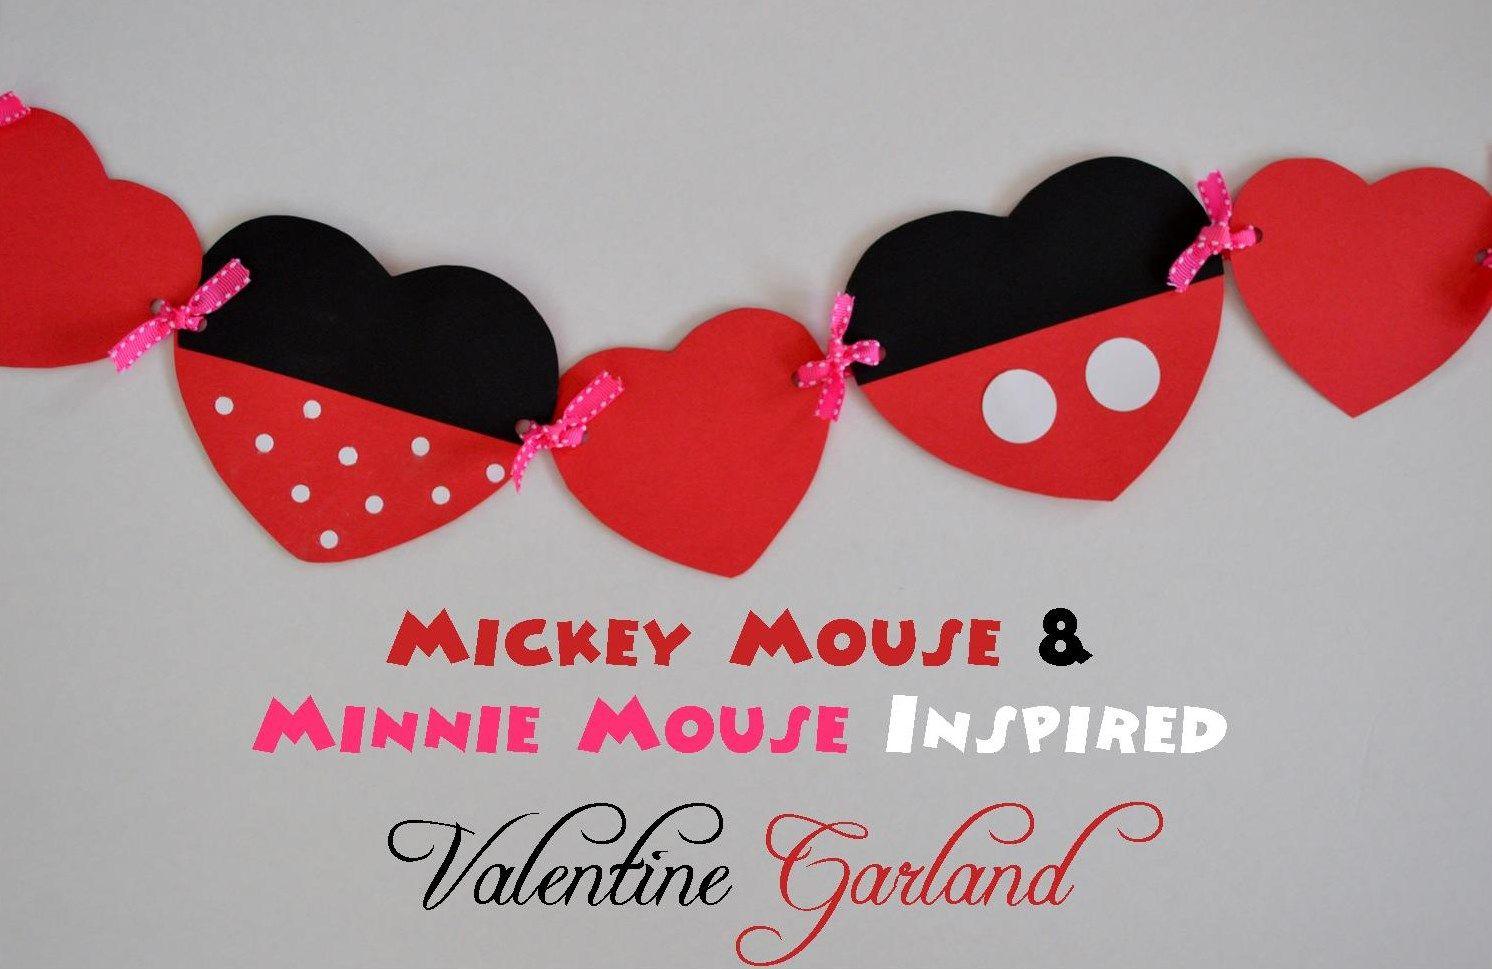 Disney Valentines Day Decorations